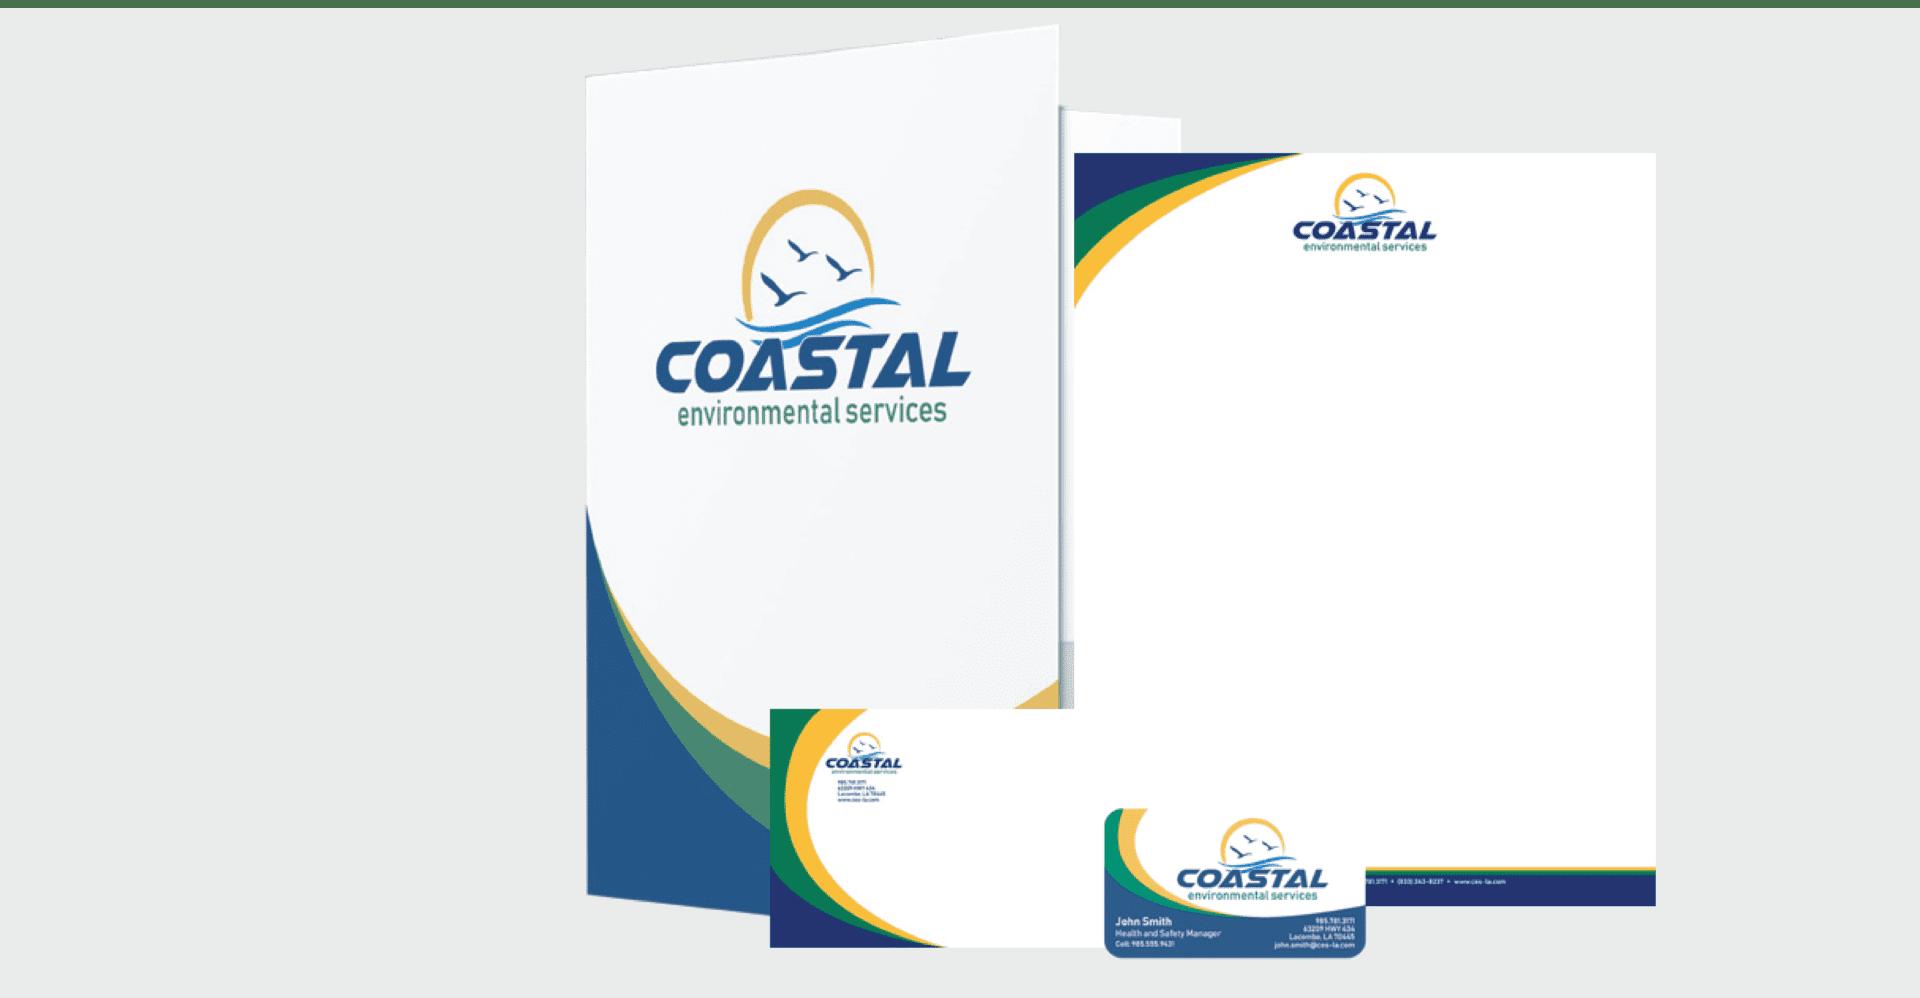 Coastal Environmental Services Example Signs SEI HQ